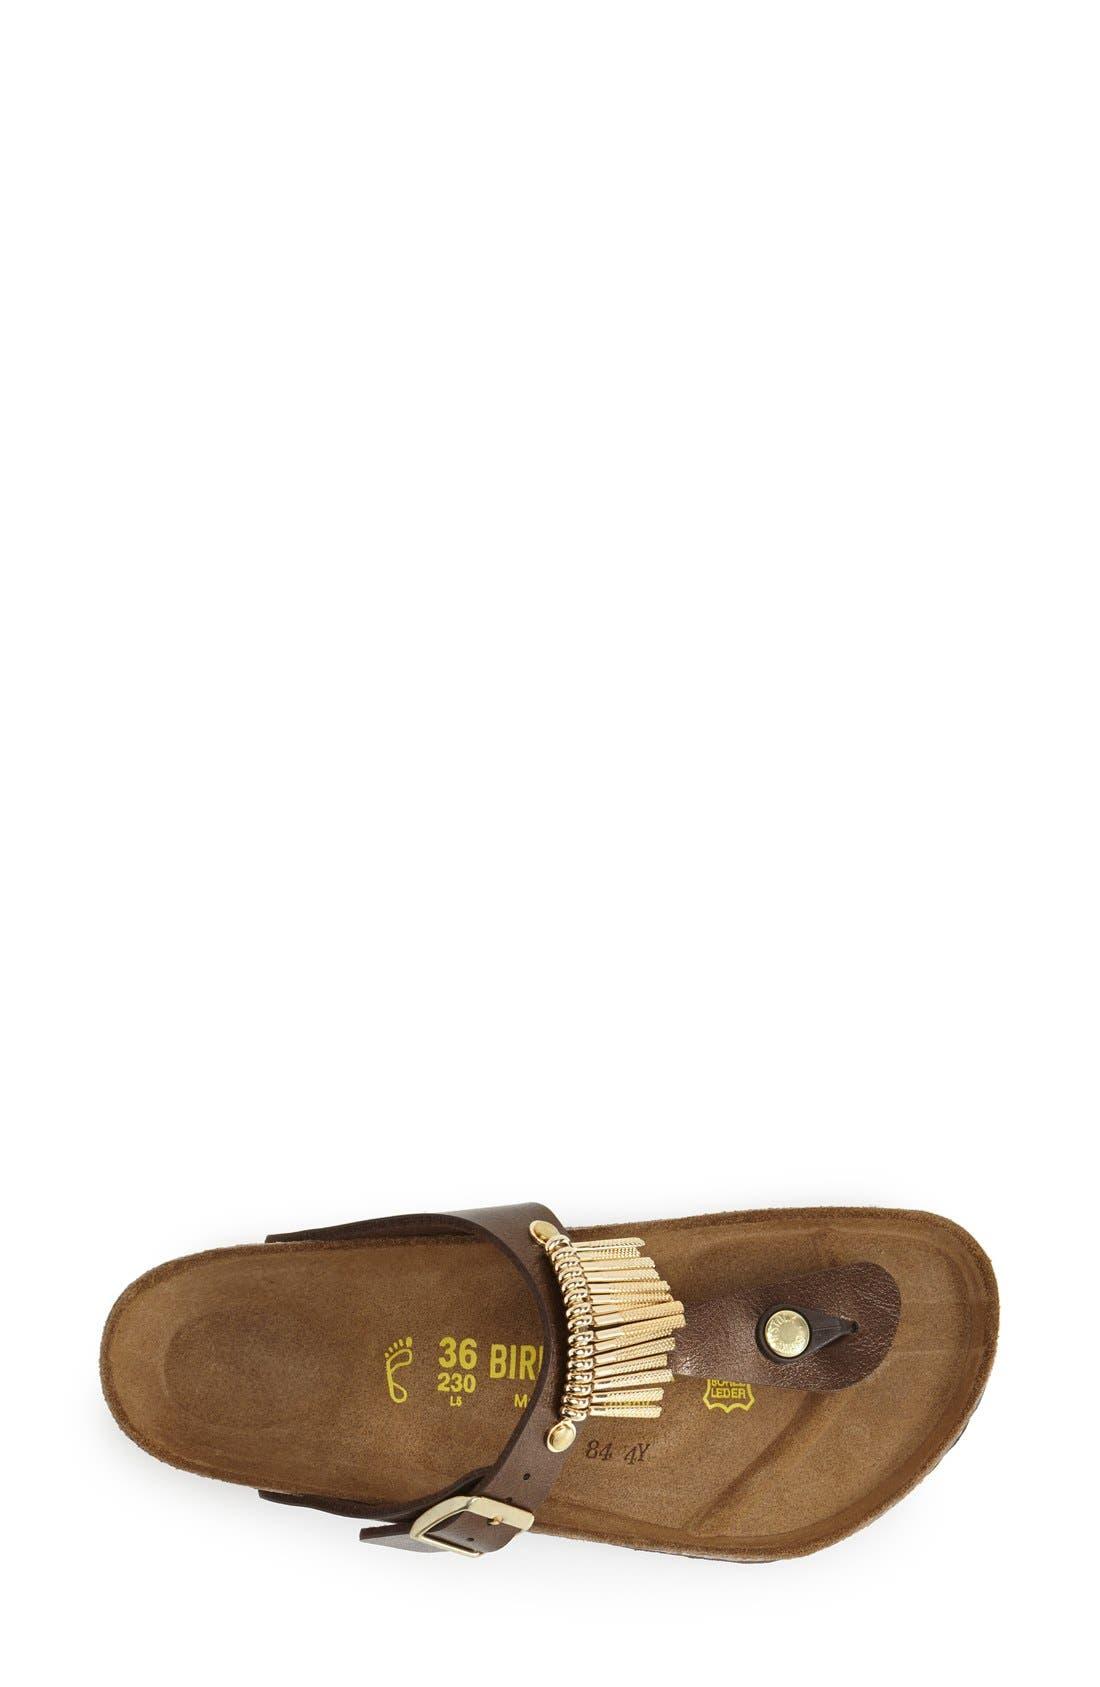 'Gizeh' Fringe Thong Sandal,                             Alternate thumbnail 3, color,                             Toffee